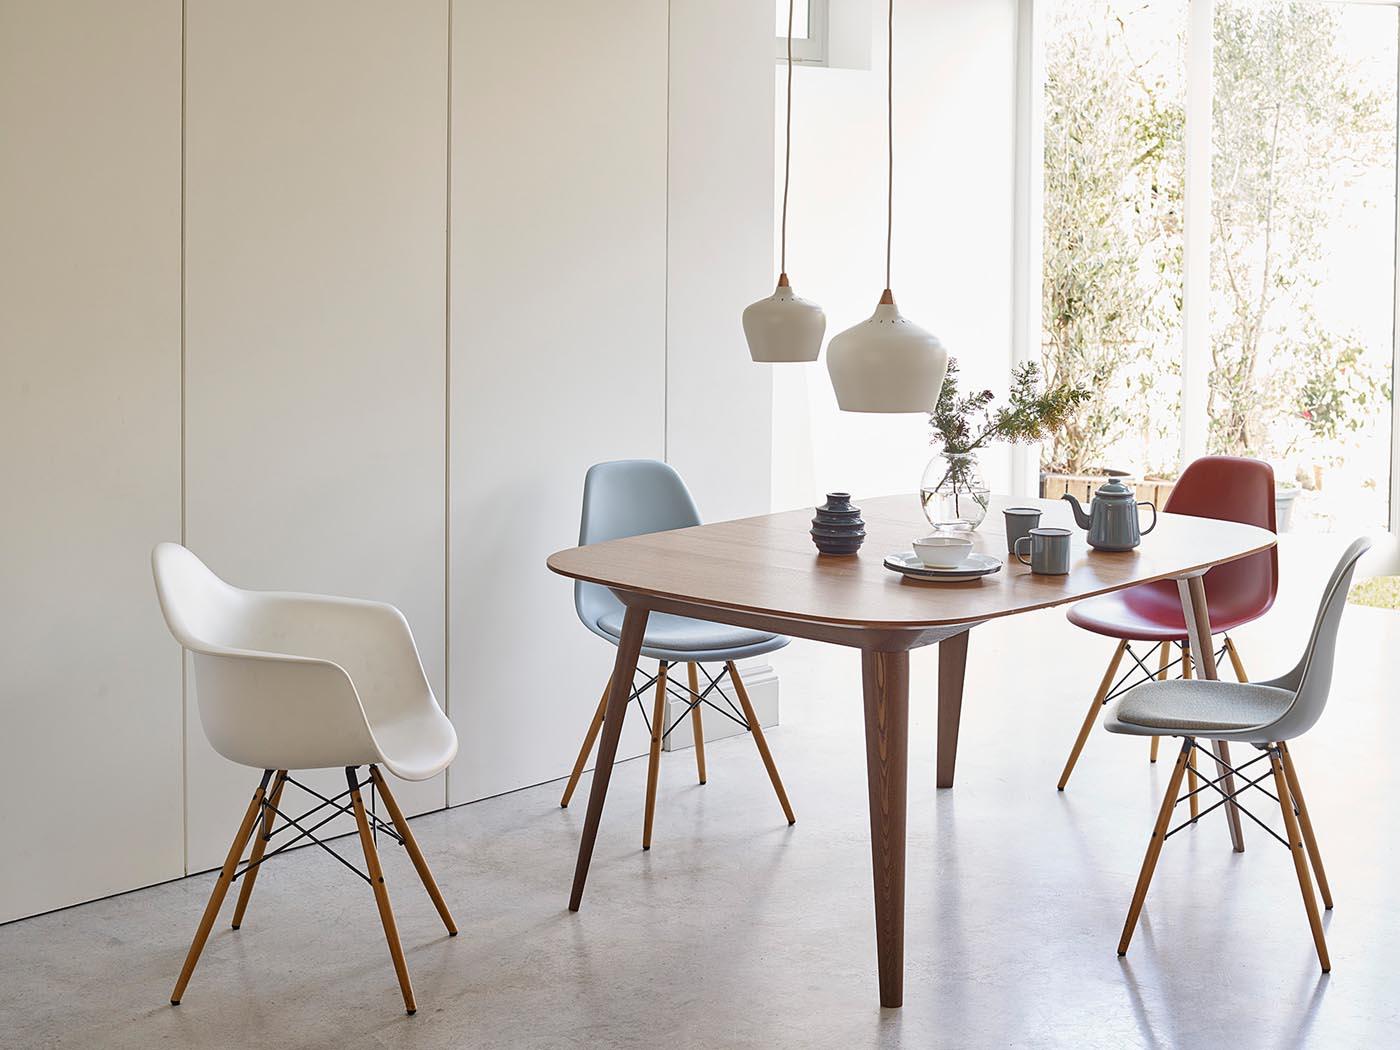 Dining Room Chairs Heals neil mersh photographer | heals dining